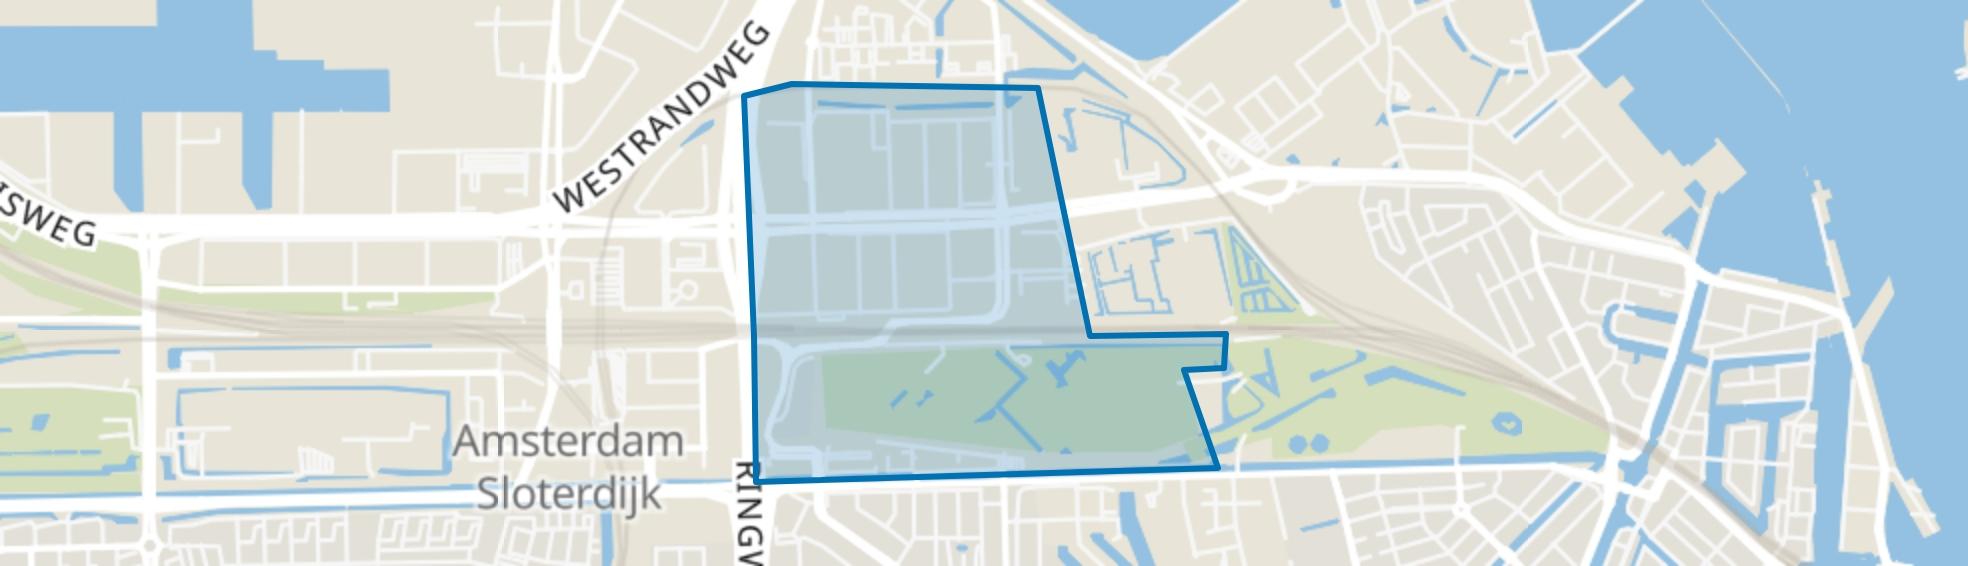 Sloterdijk, Amsterdam map